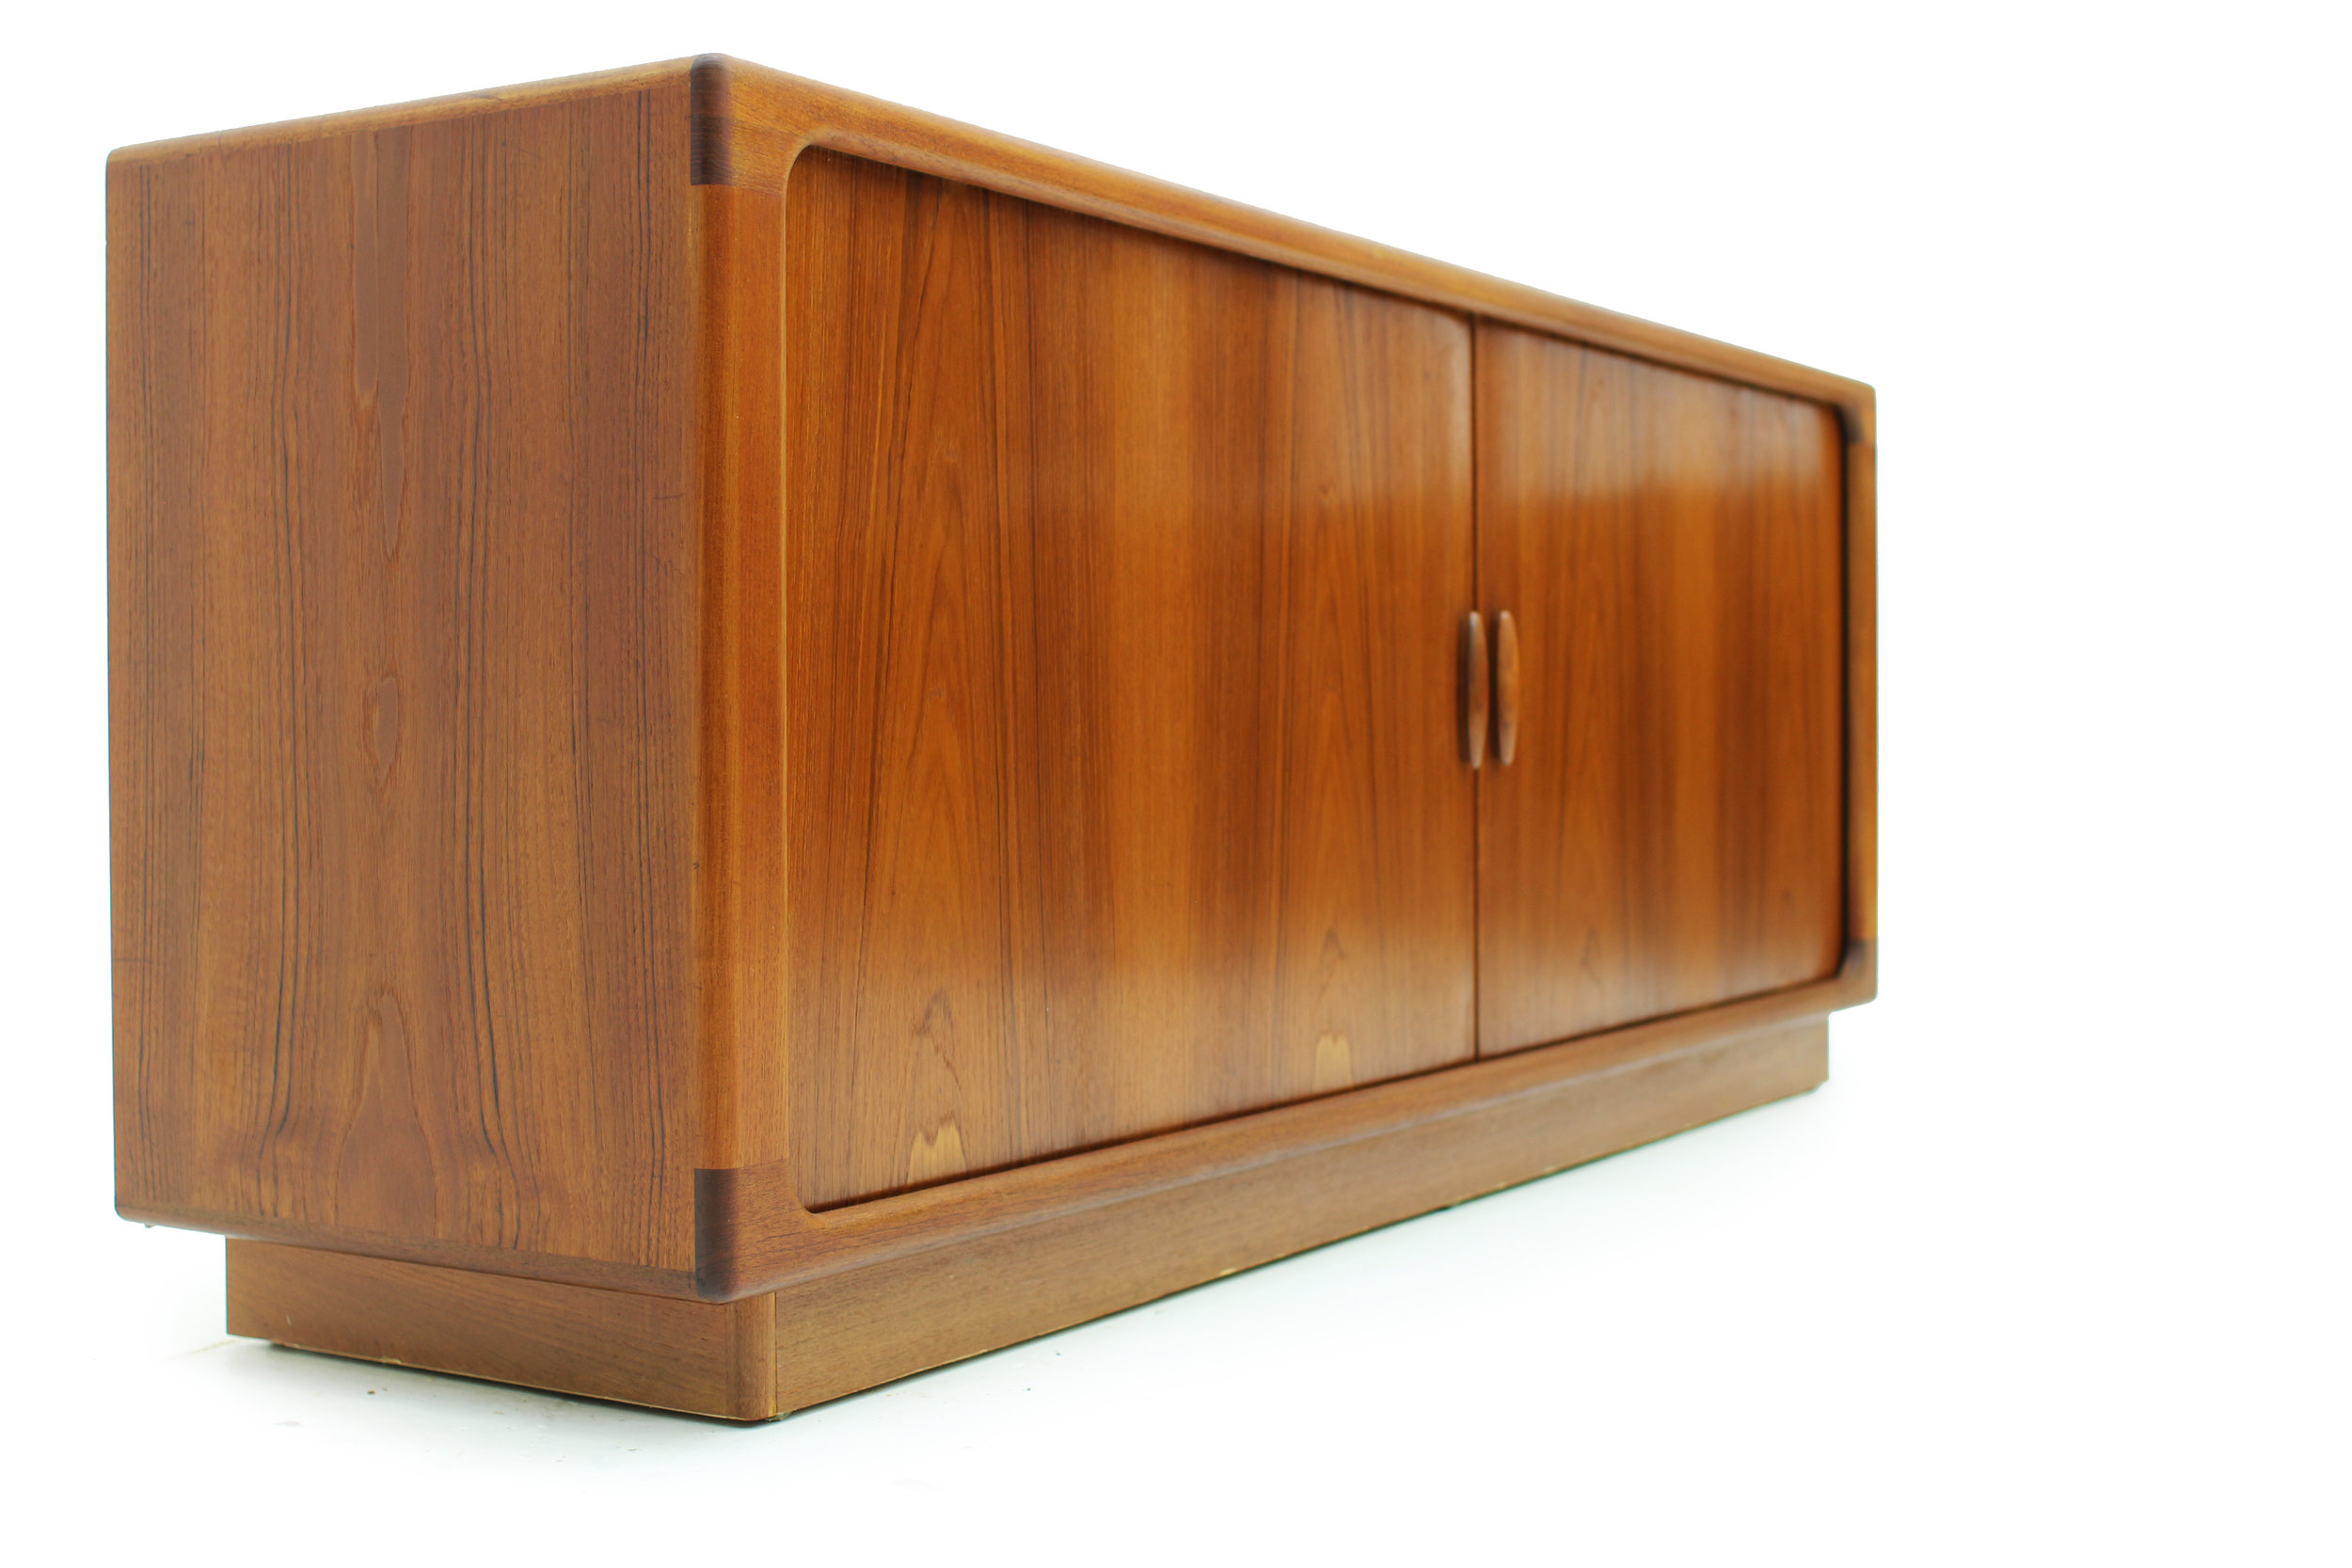 Danish Teak Sideboard with Tambour Doors Made by Dyrlund (4).jpg